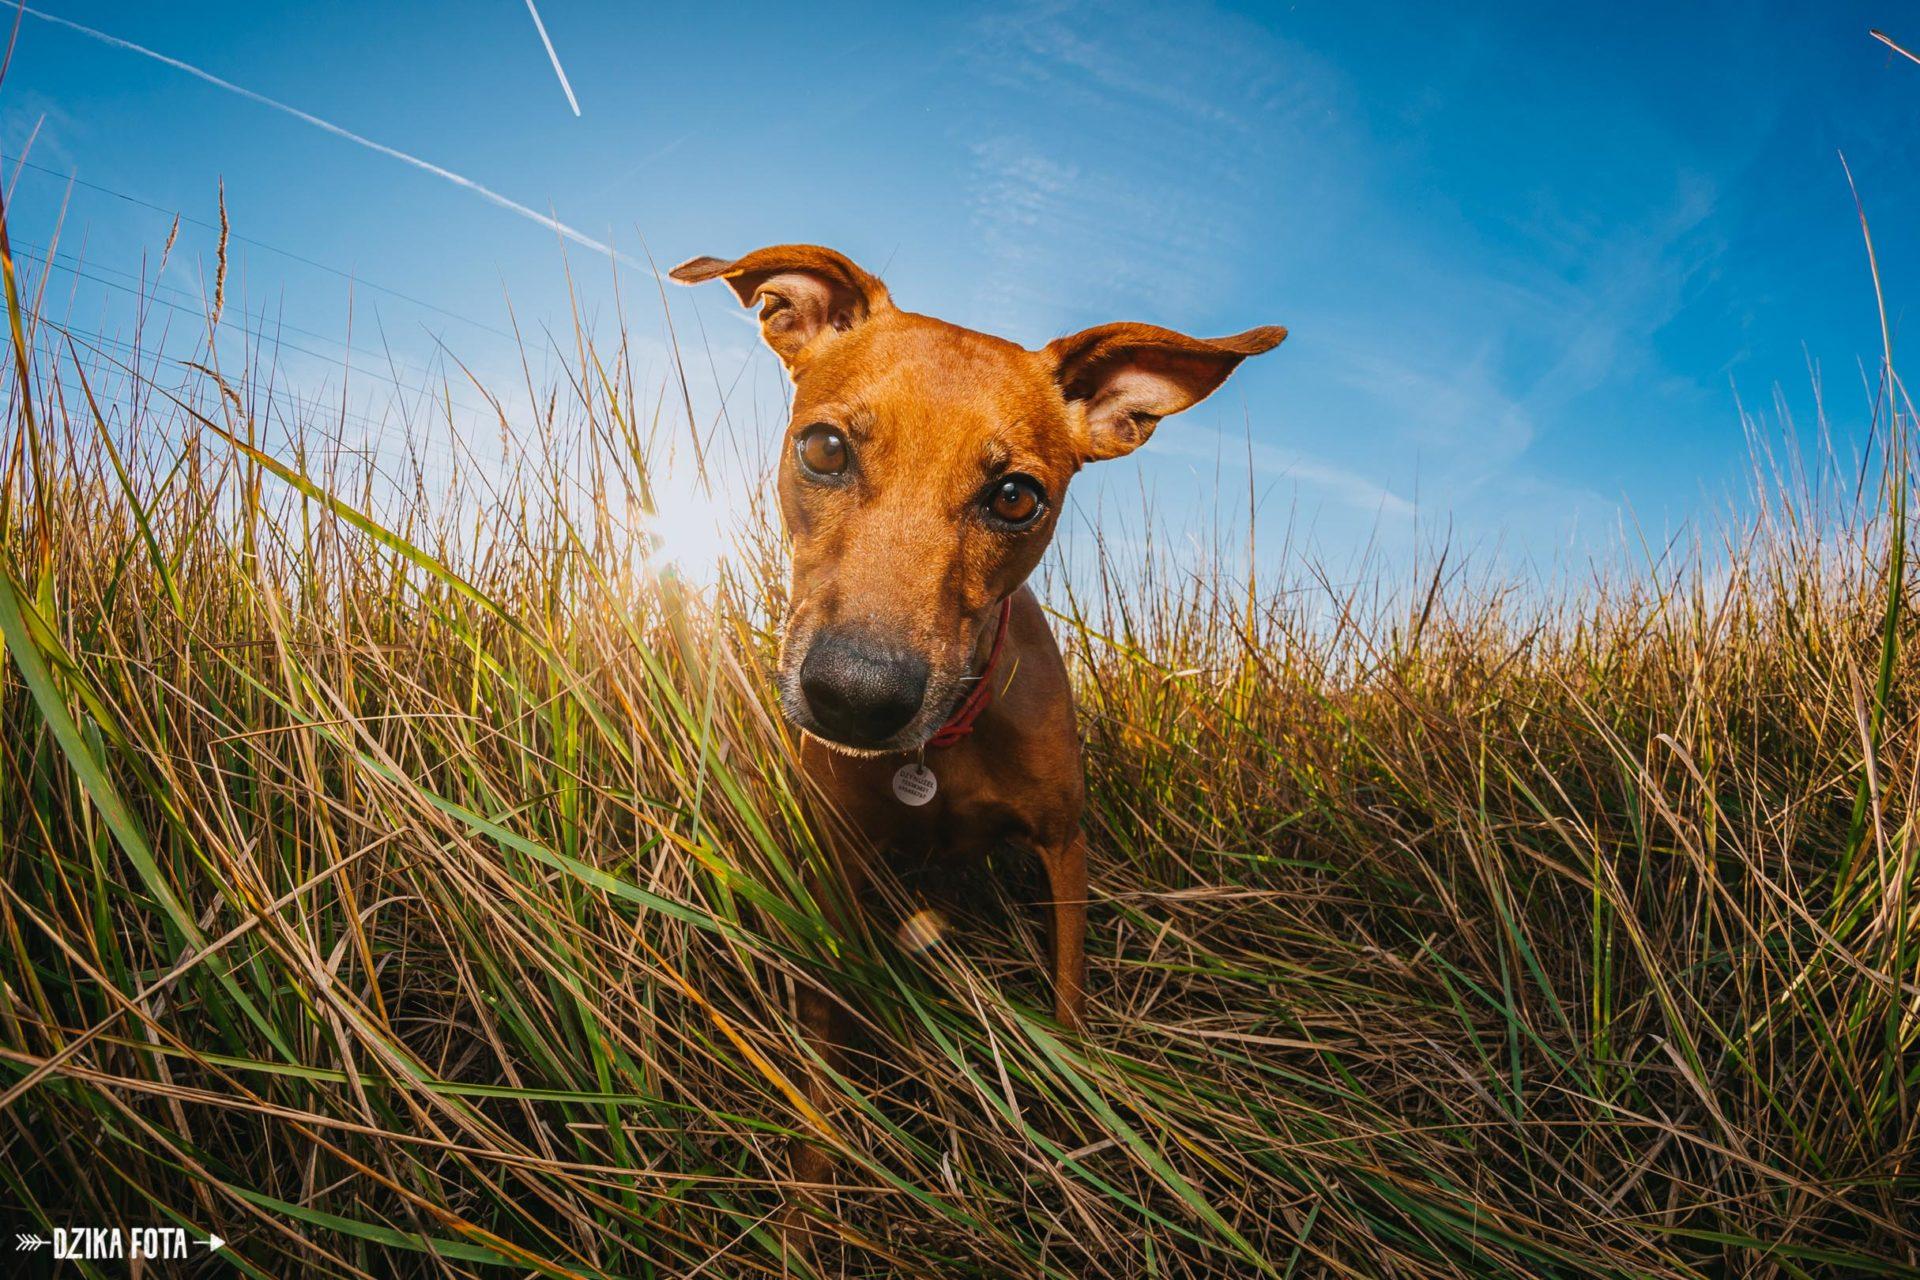 pies zdjęcie fotograf